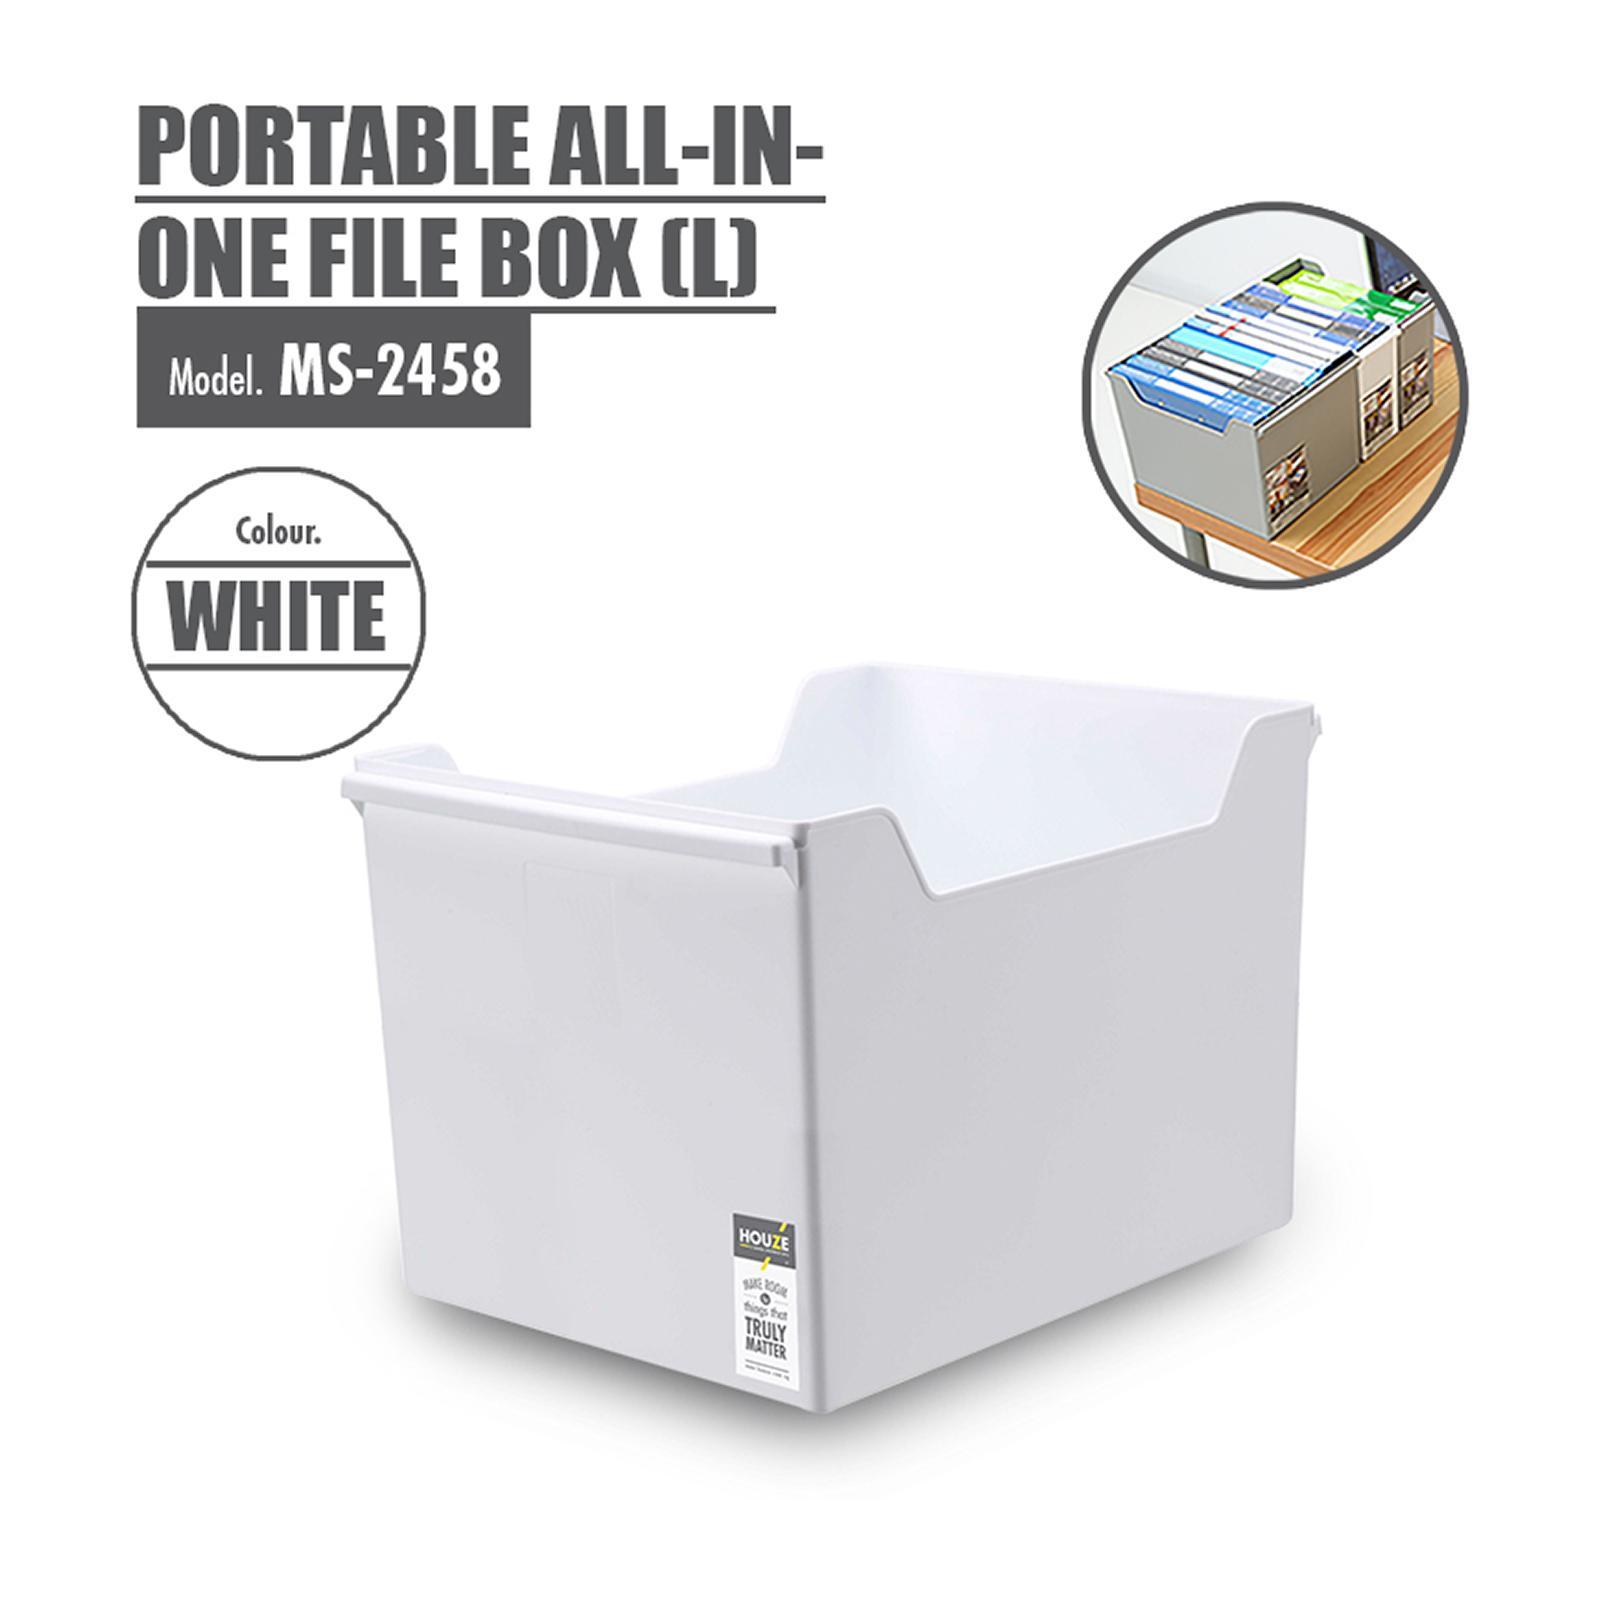 HOUZE Portable All-In-One File Box (L) (Dim: 35 x 26 x 24cm)